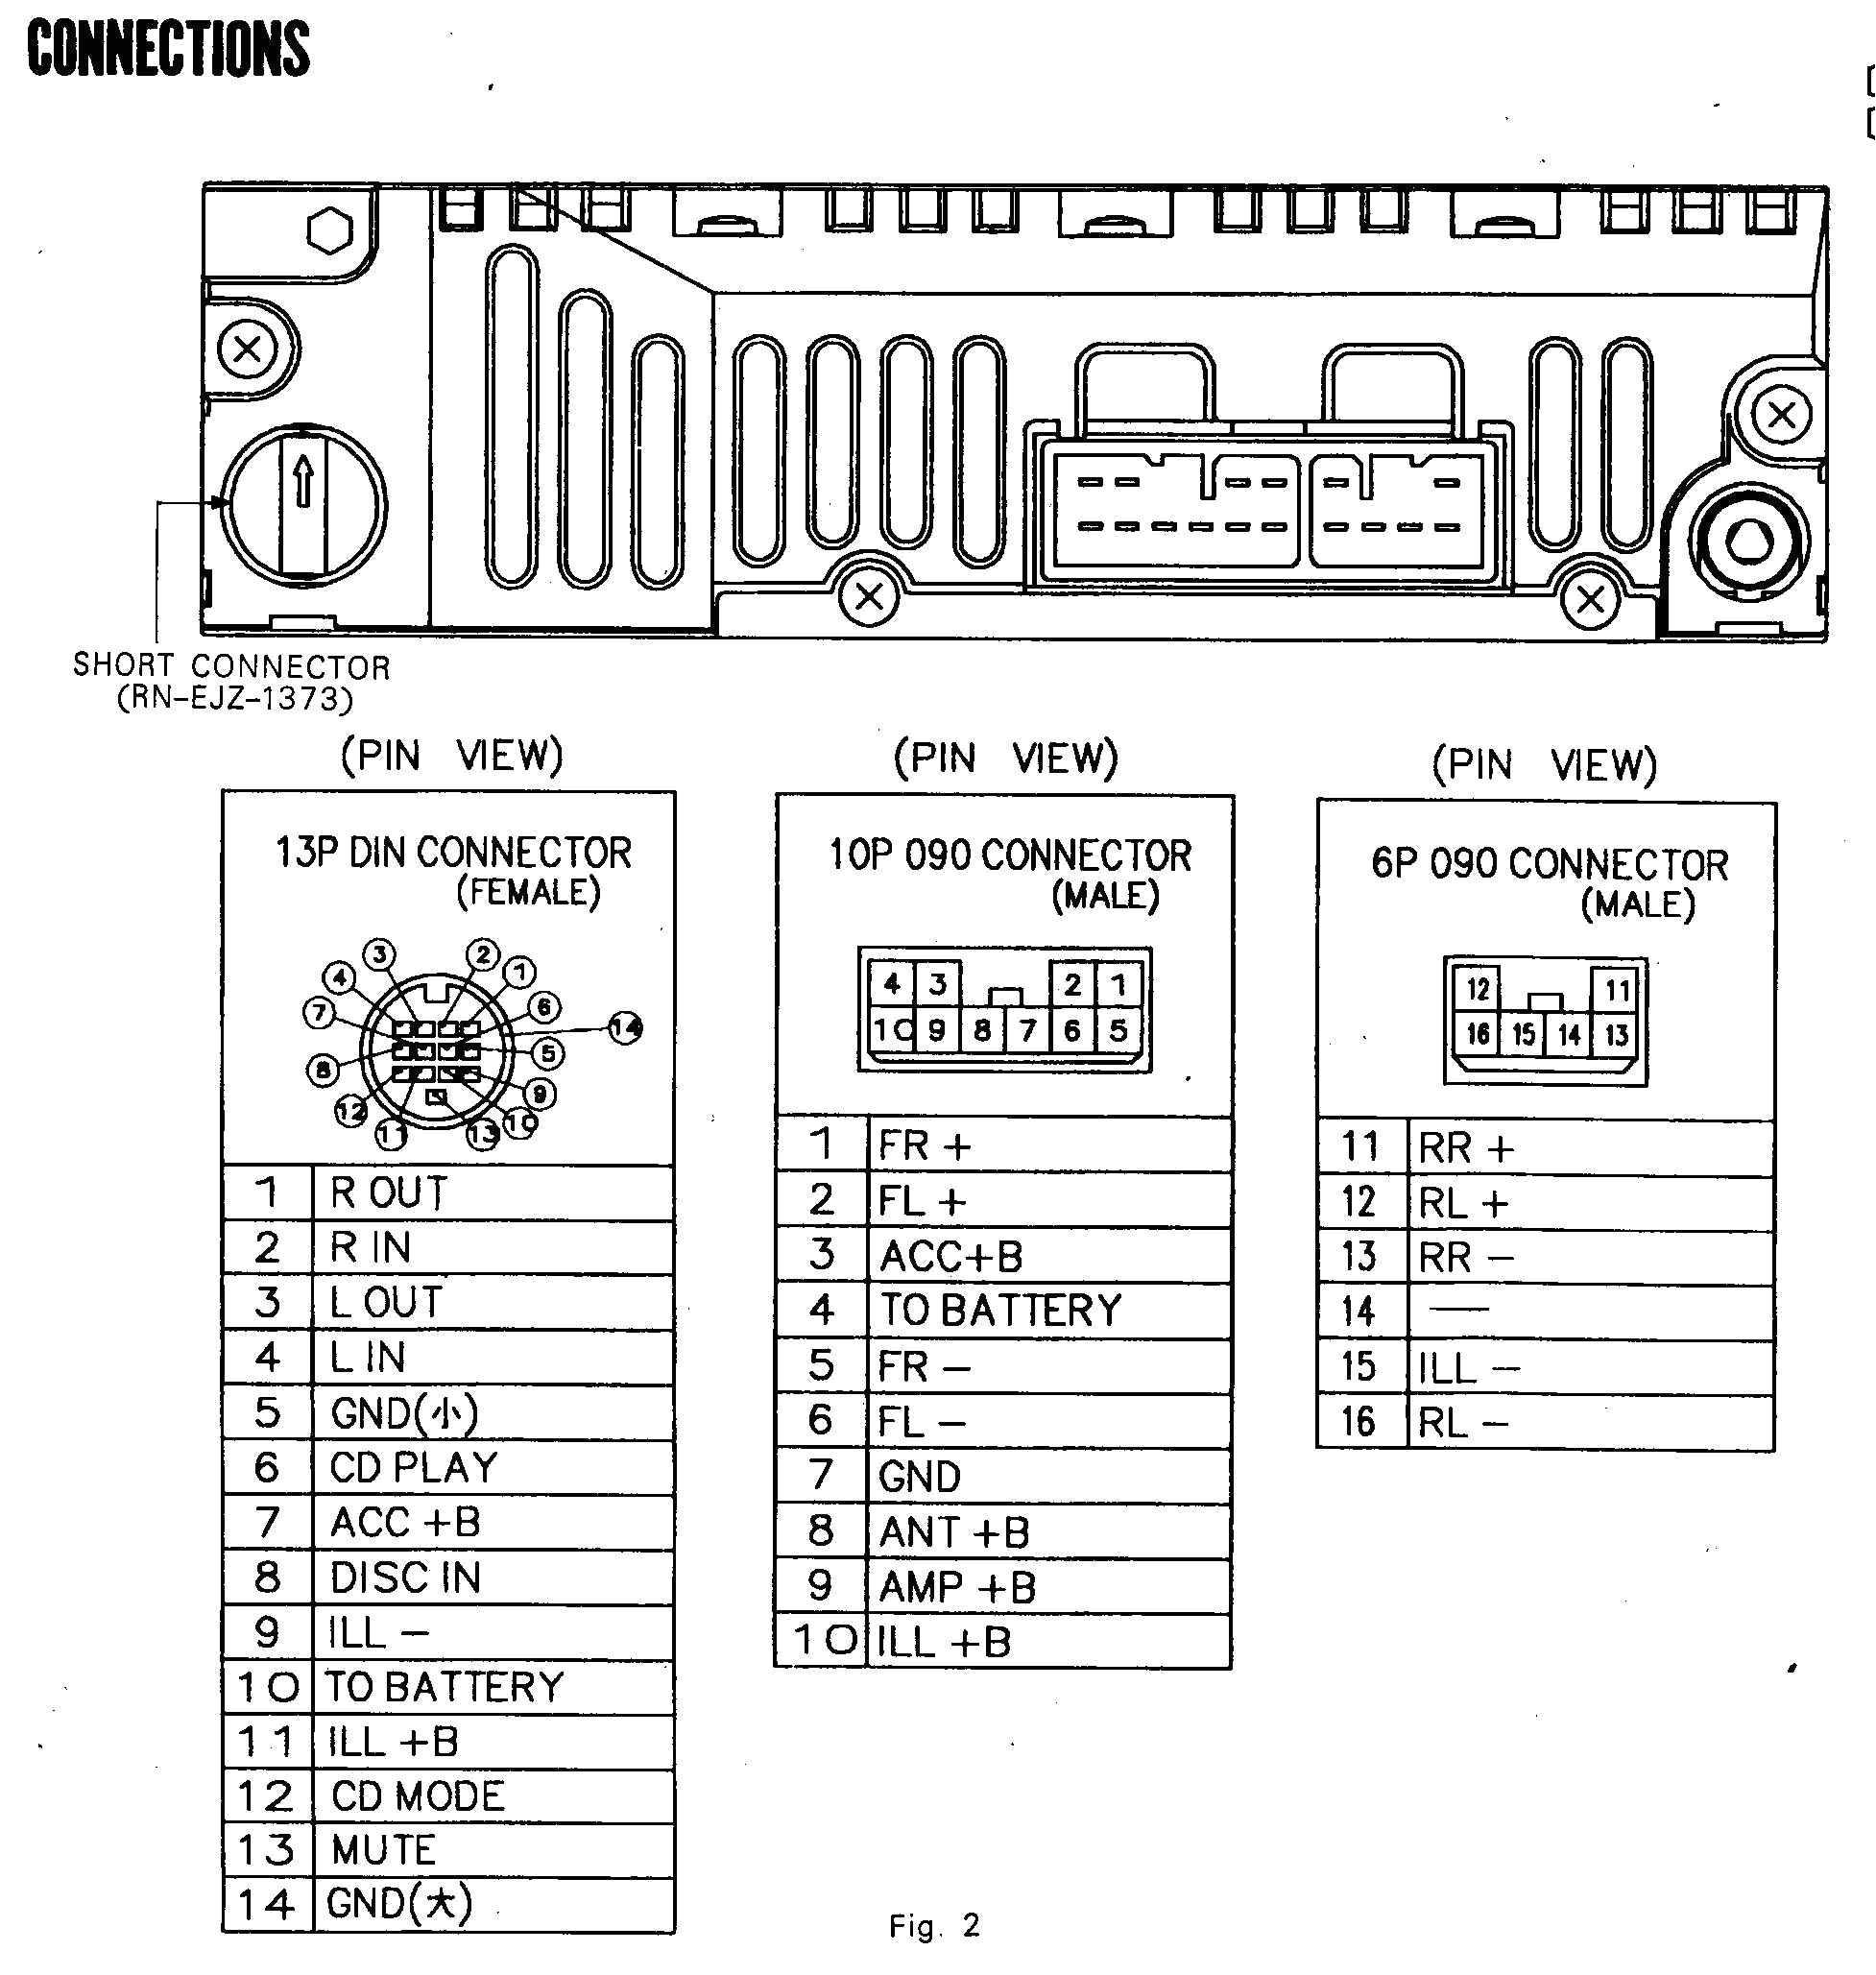 fujitsu ten wiring diagram wiring diagram expert fujitsu ten radio wiring diagram fujitsu ten wiring diagram